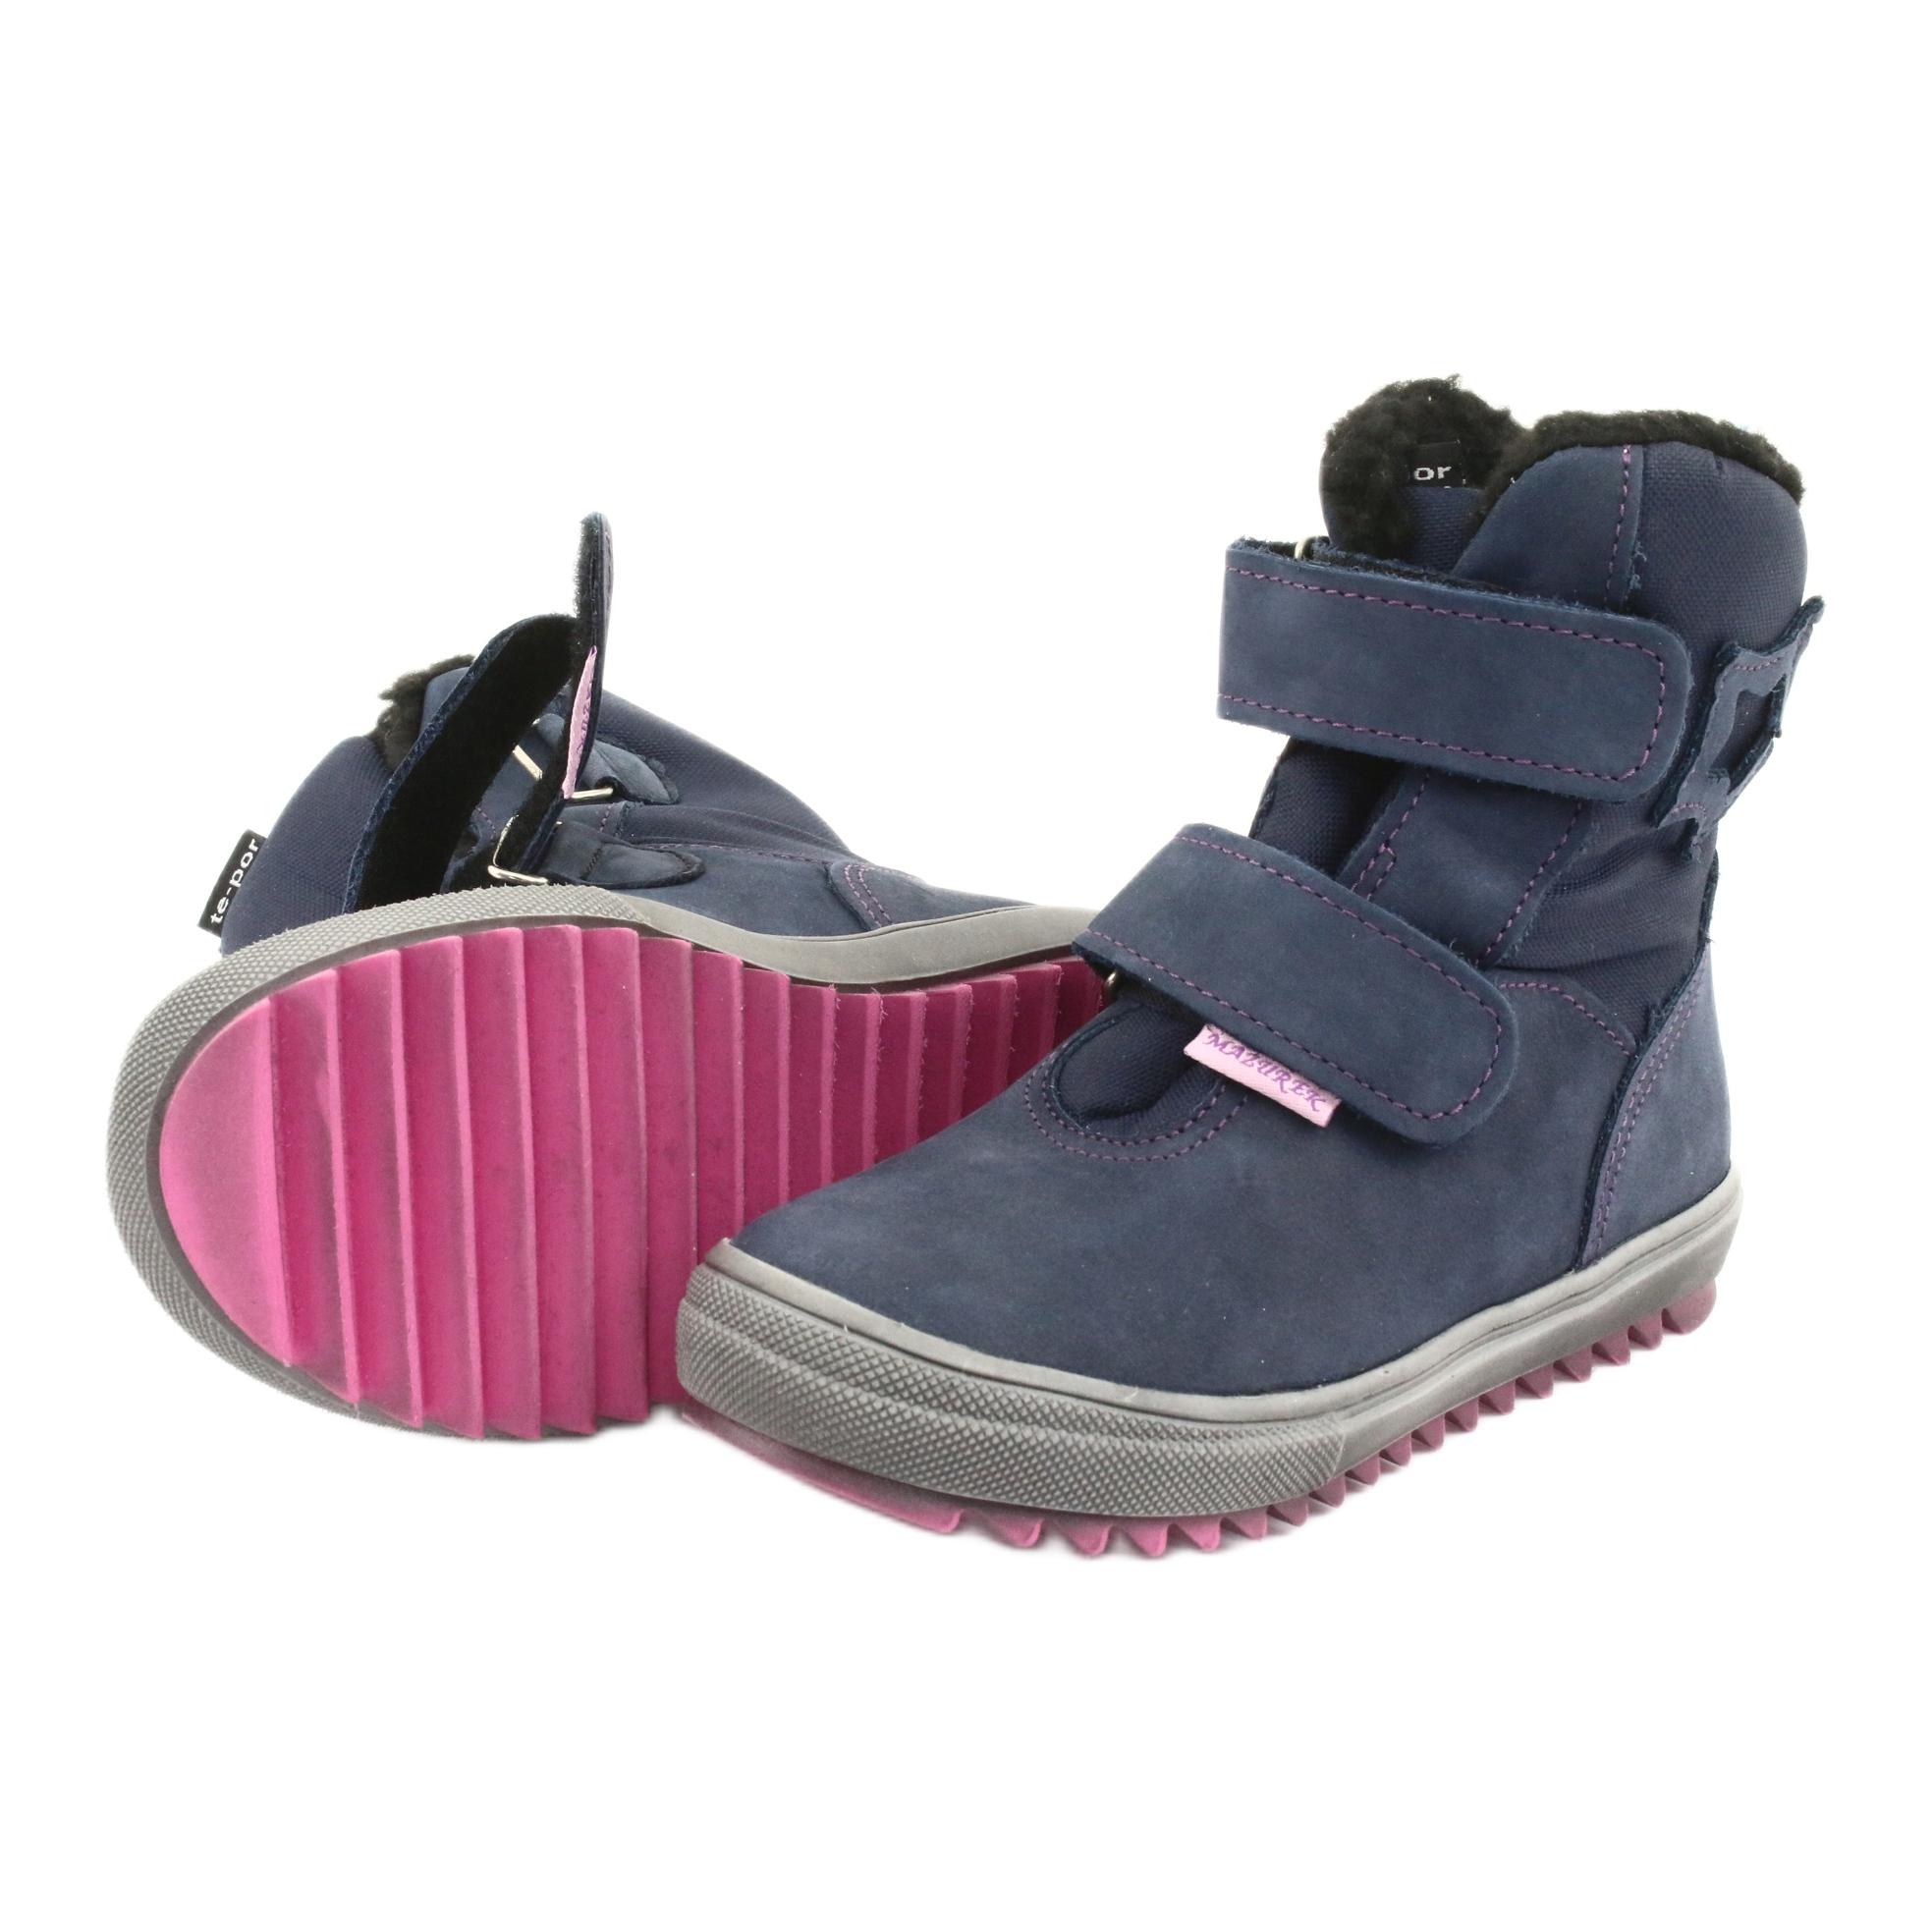 miniatura 6 - Stivali con una membrana Mazurek 1353 blu scuro marina rosa